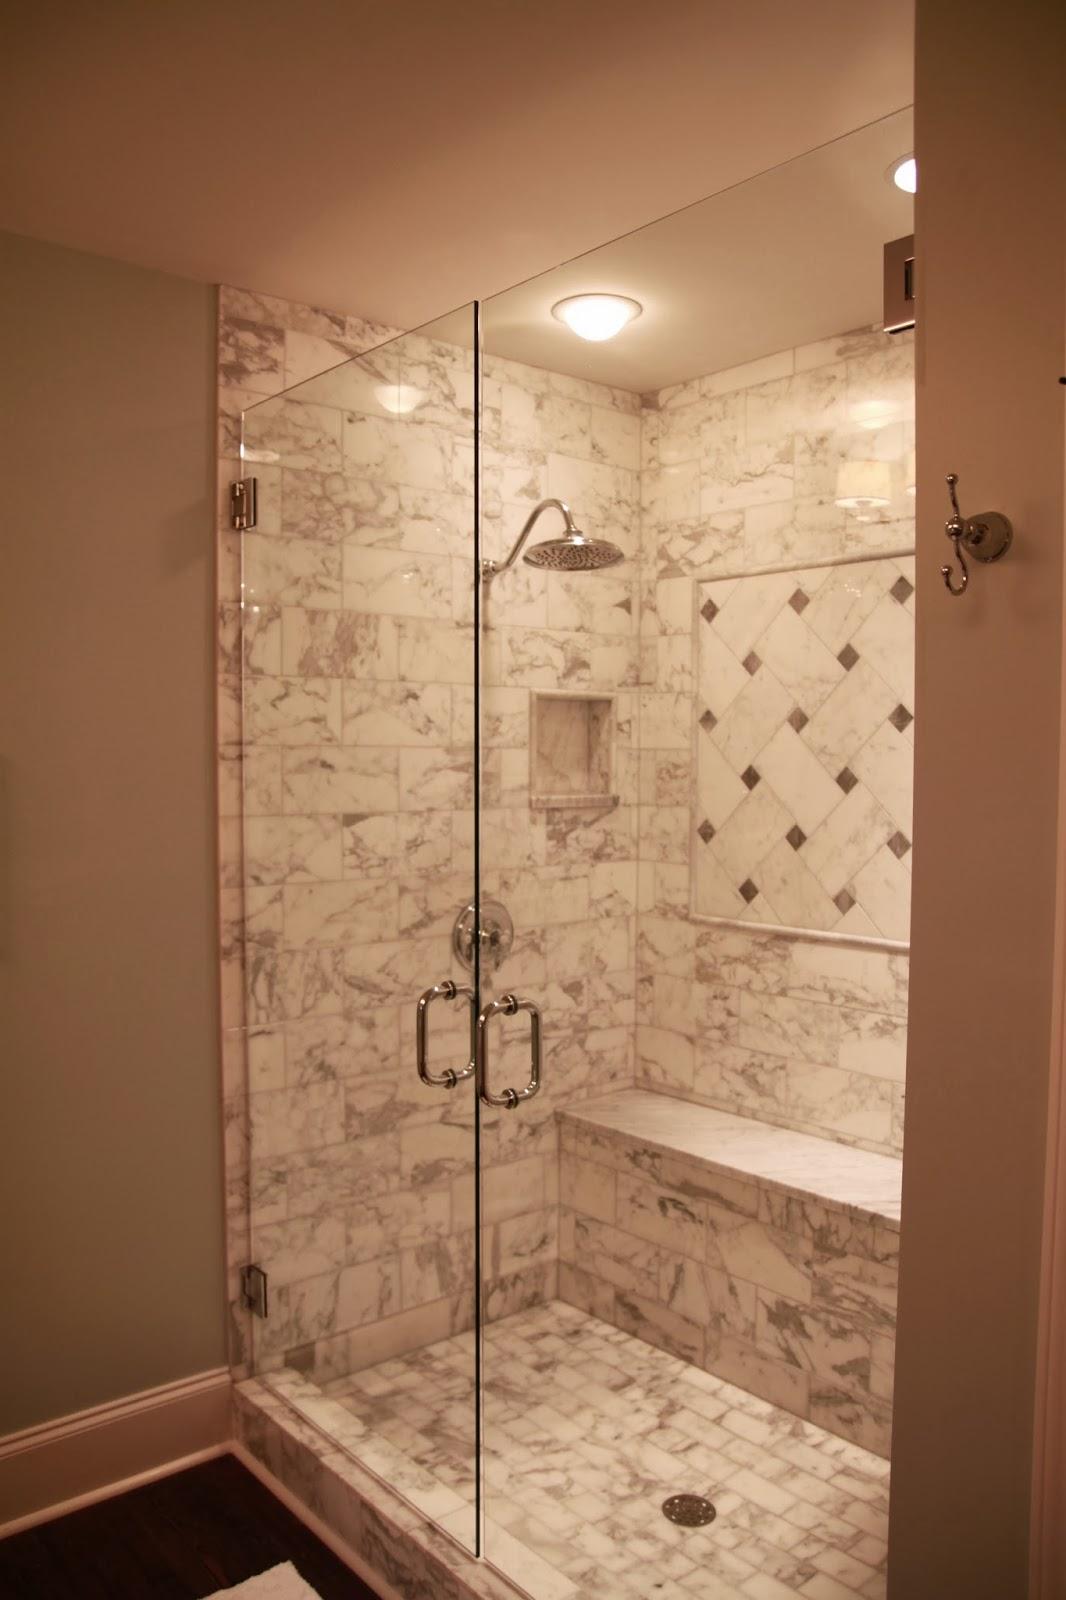 Tollywog 39 s blog house tour master bathroom for Megan u bathroom tour